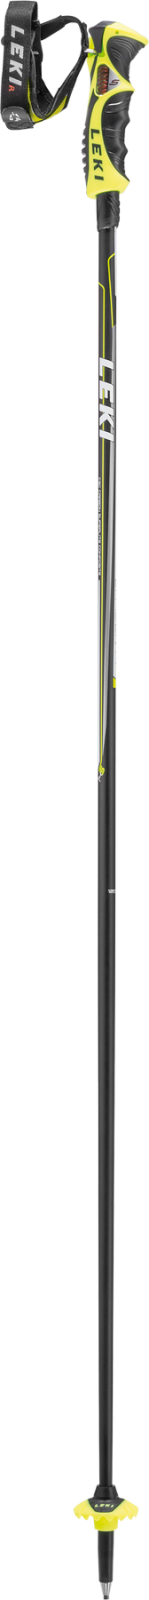 Leki Carbon 14 S - zelená